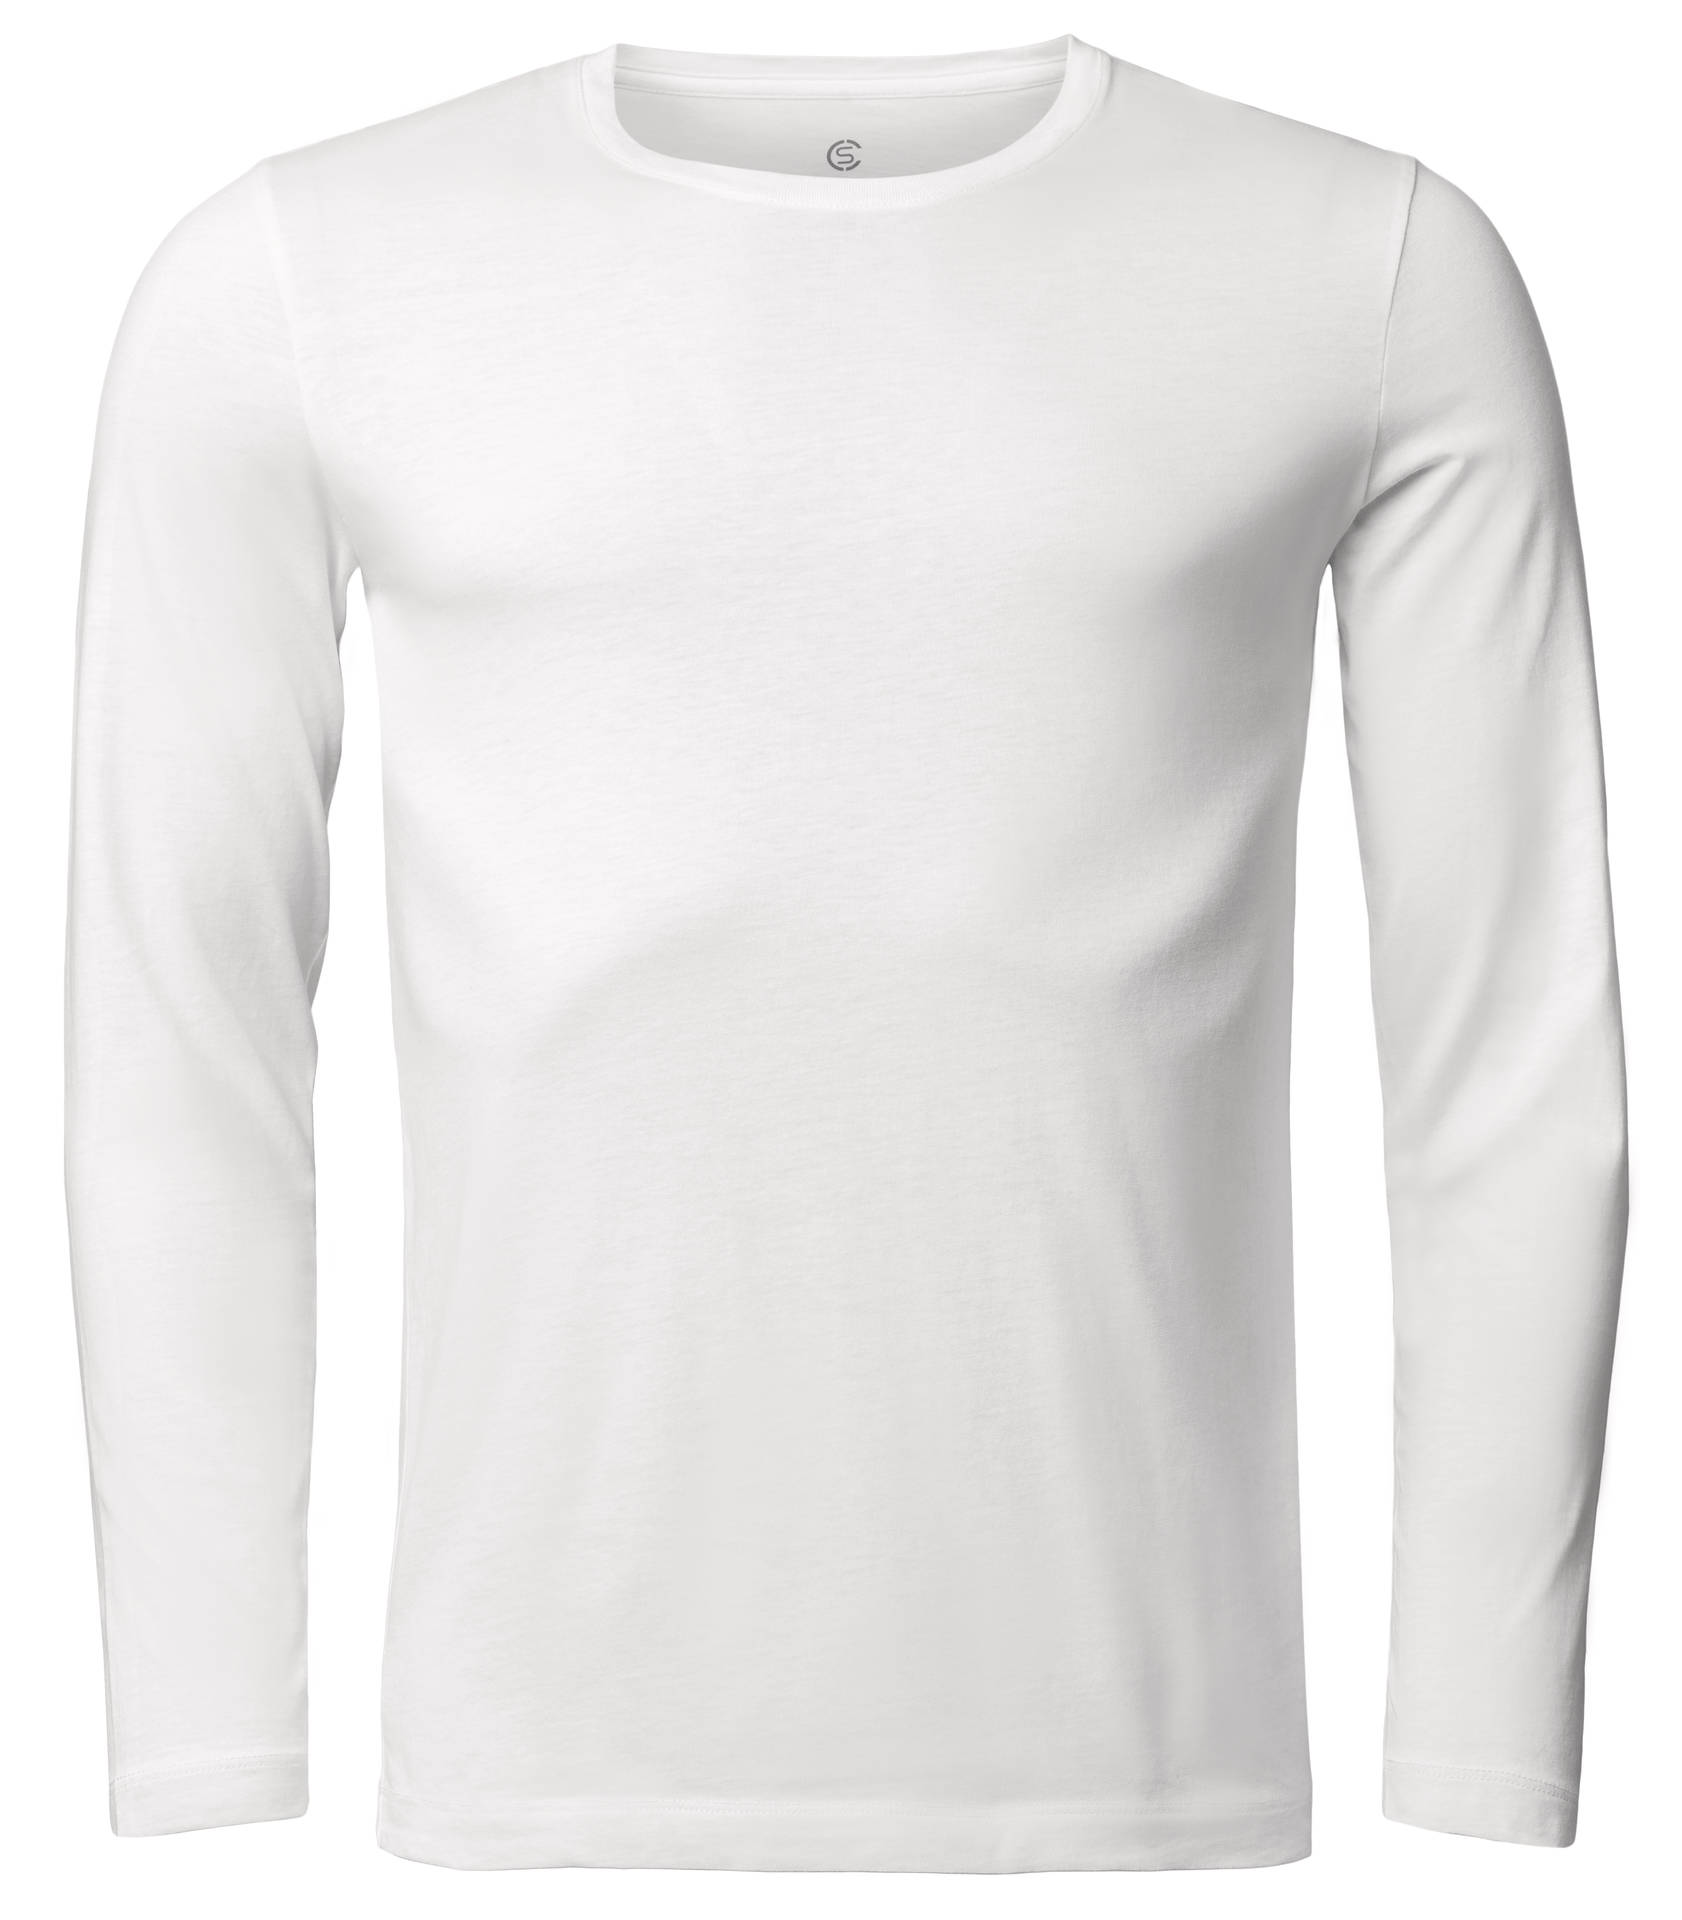 Anita-Long Sleeve Round-Neck T-Shirt, Sir Max Long